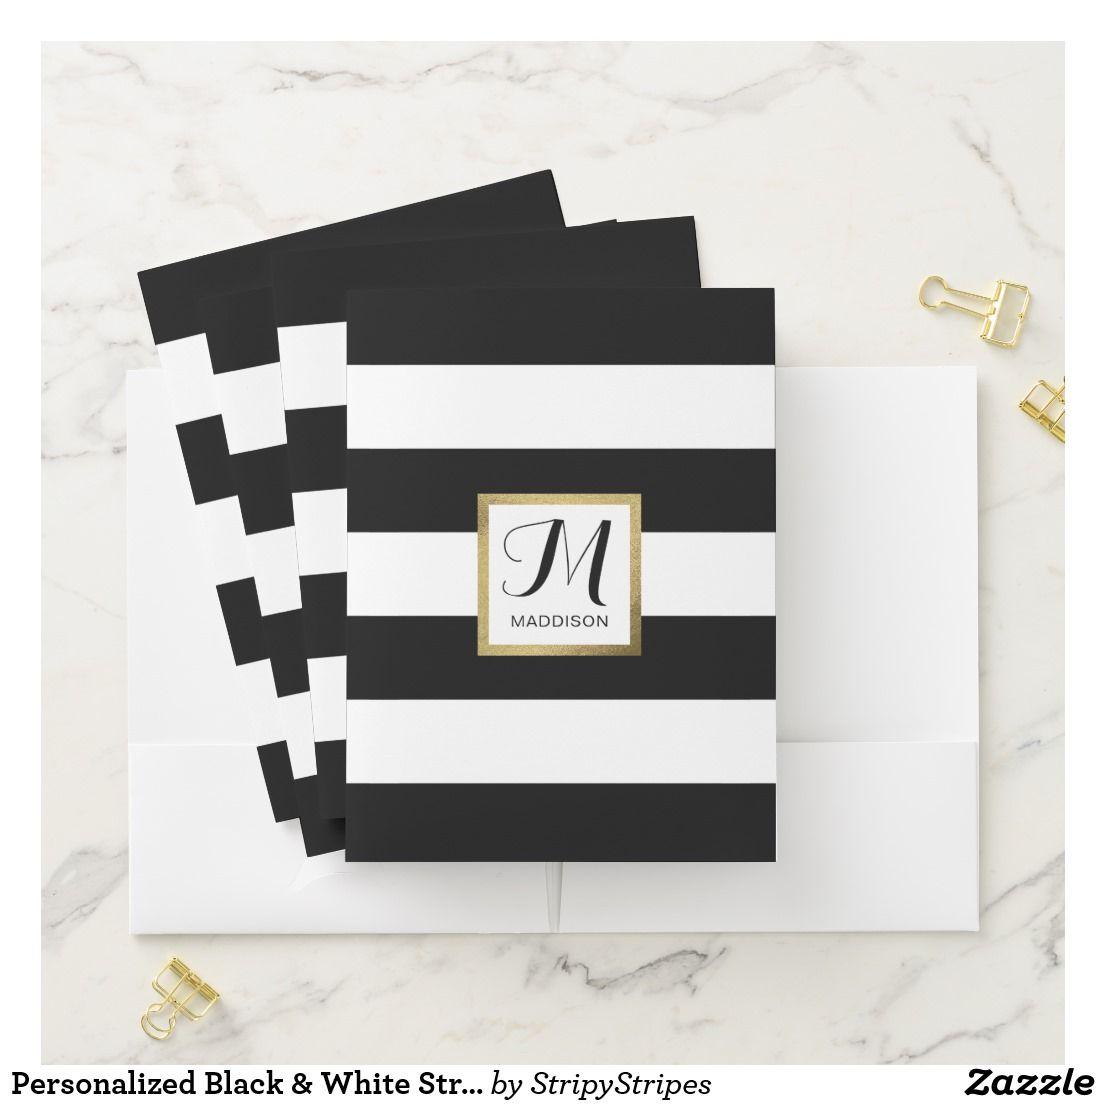 Personalized Black & White Striped Gold Monogram Pocket